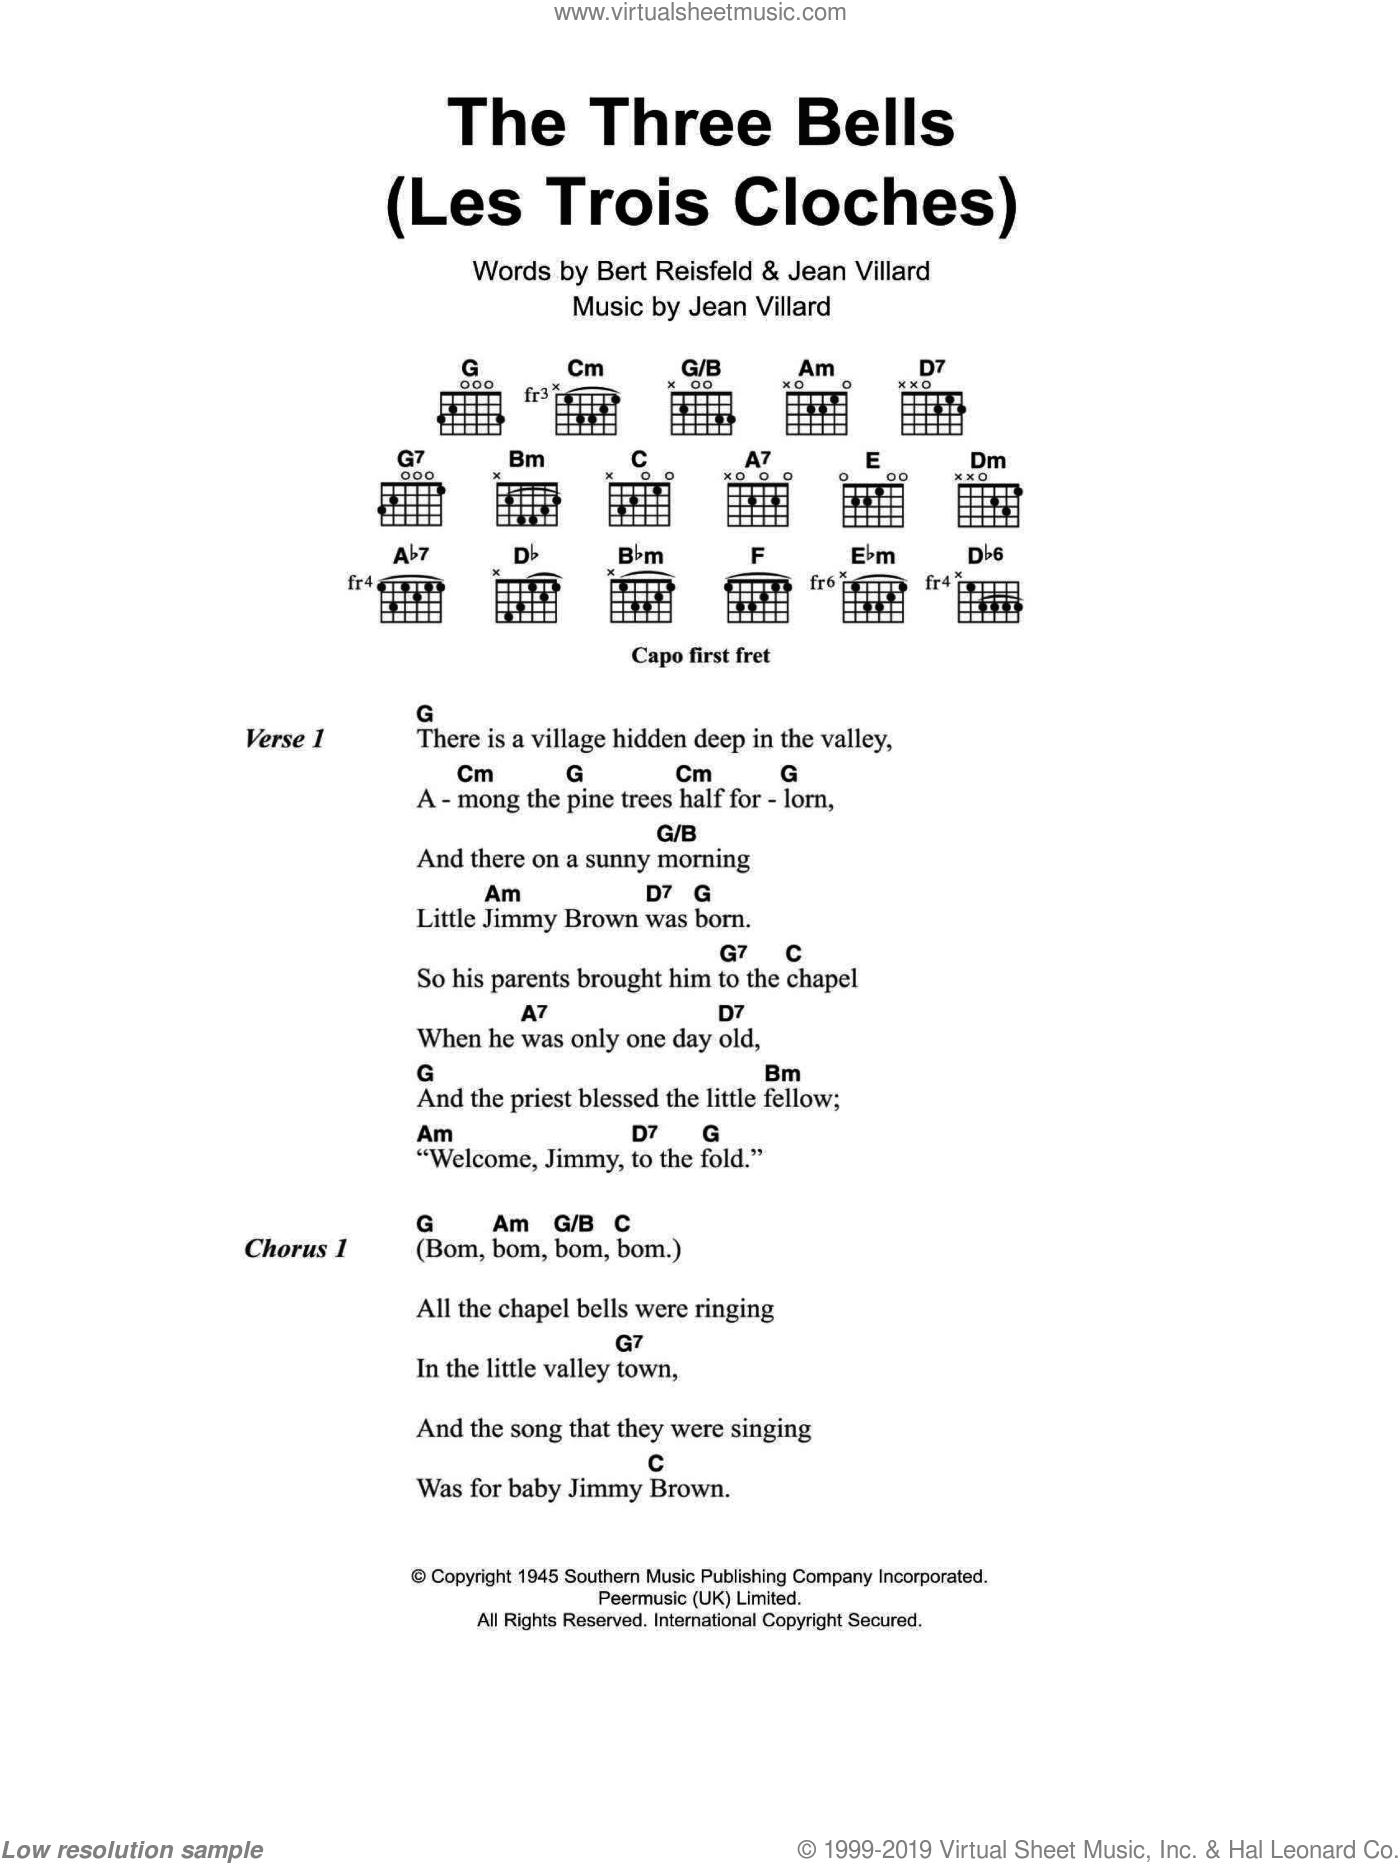 The Three Bells (Les Trois Cloches) sheet music for guitar (chords) by Edith Piaf, Bert Reisfeld and Jean Villard, intermediate skill level